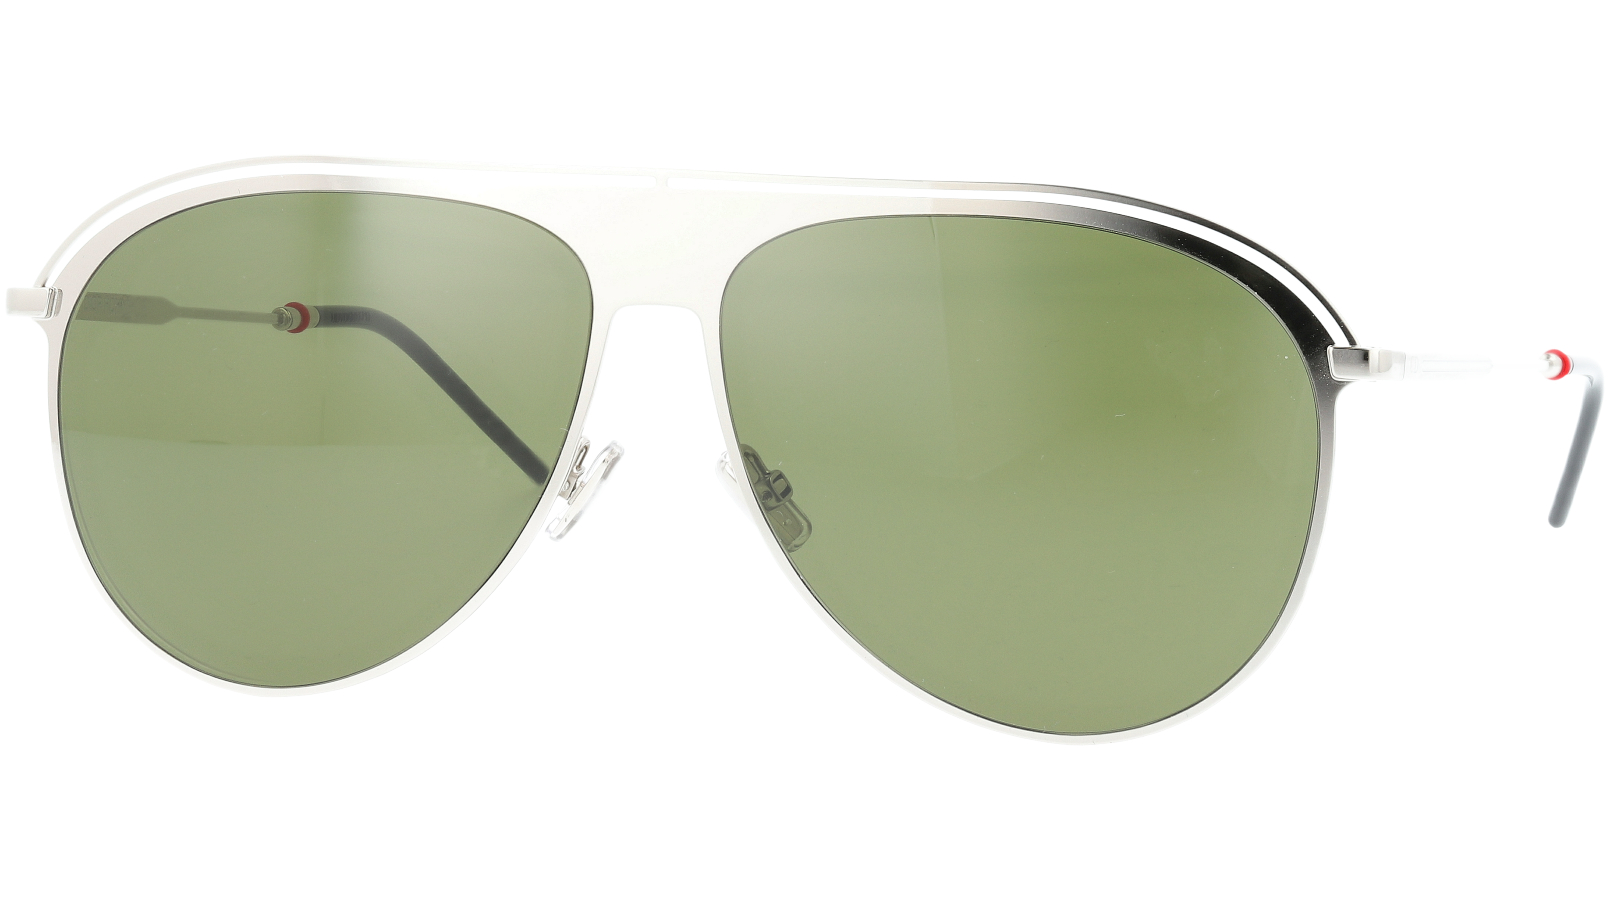 DIOR DIOR0217S KTUQT 59 PALLAD Sunglasses